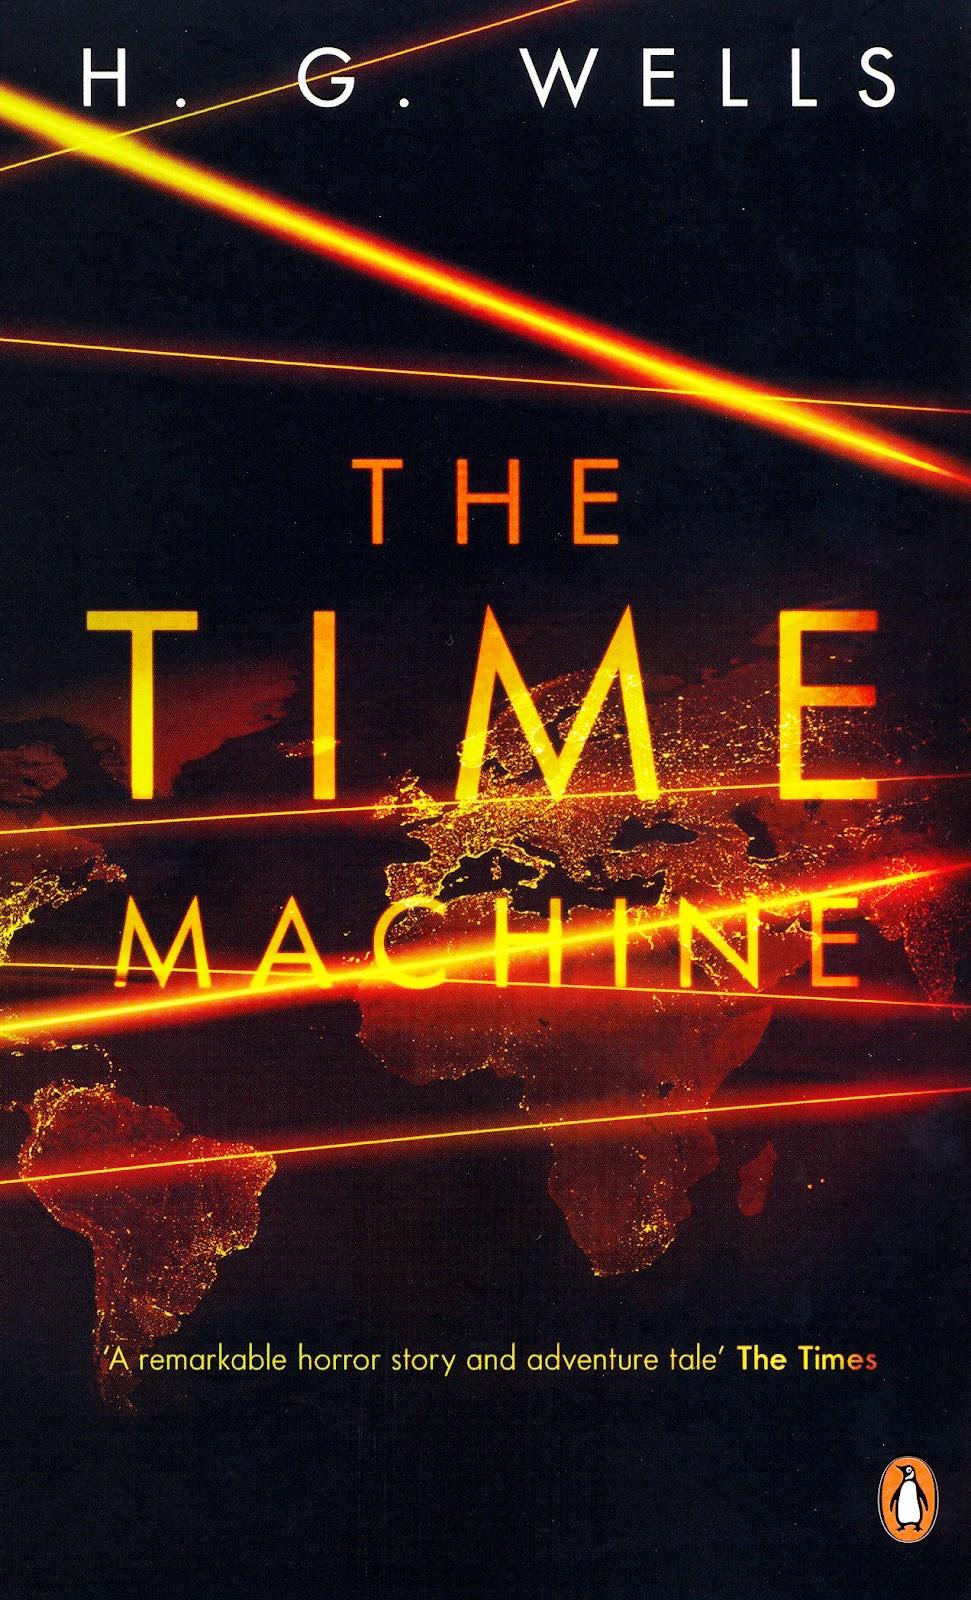 analysis of time machine Amazoncom: a literary analysis of 'the time machine' by h g wells ebook: adam smith: kindle store.